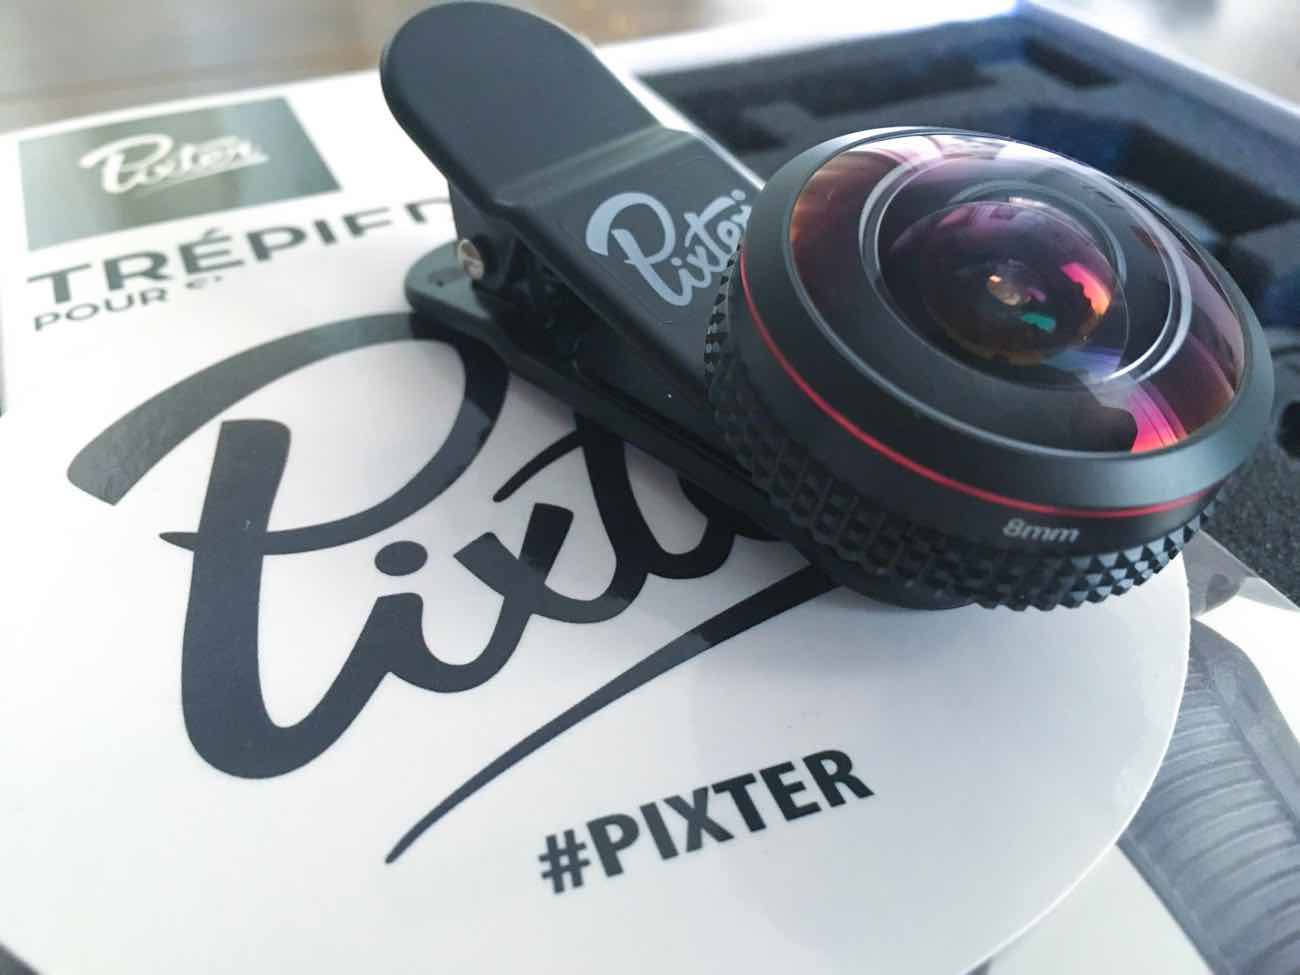 best smartphone camera fisheye lens pixter review